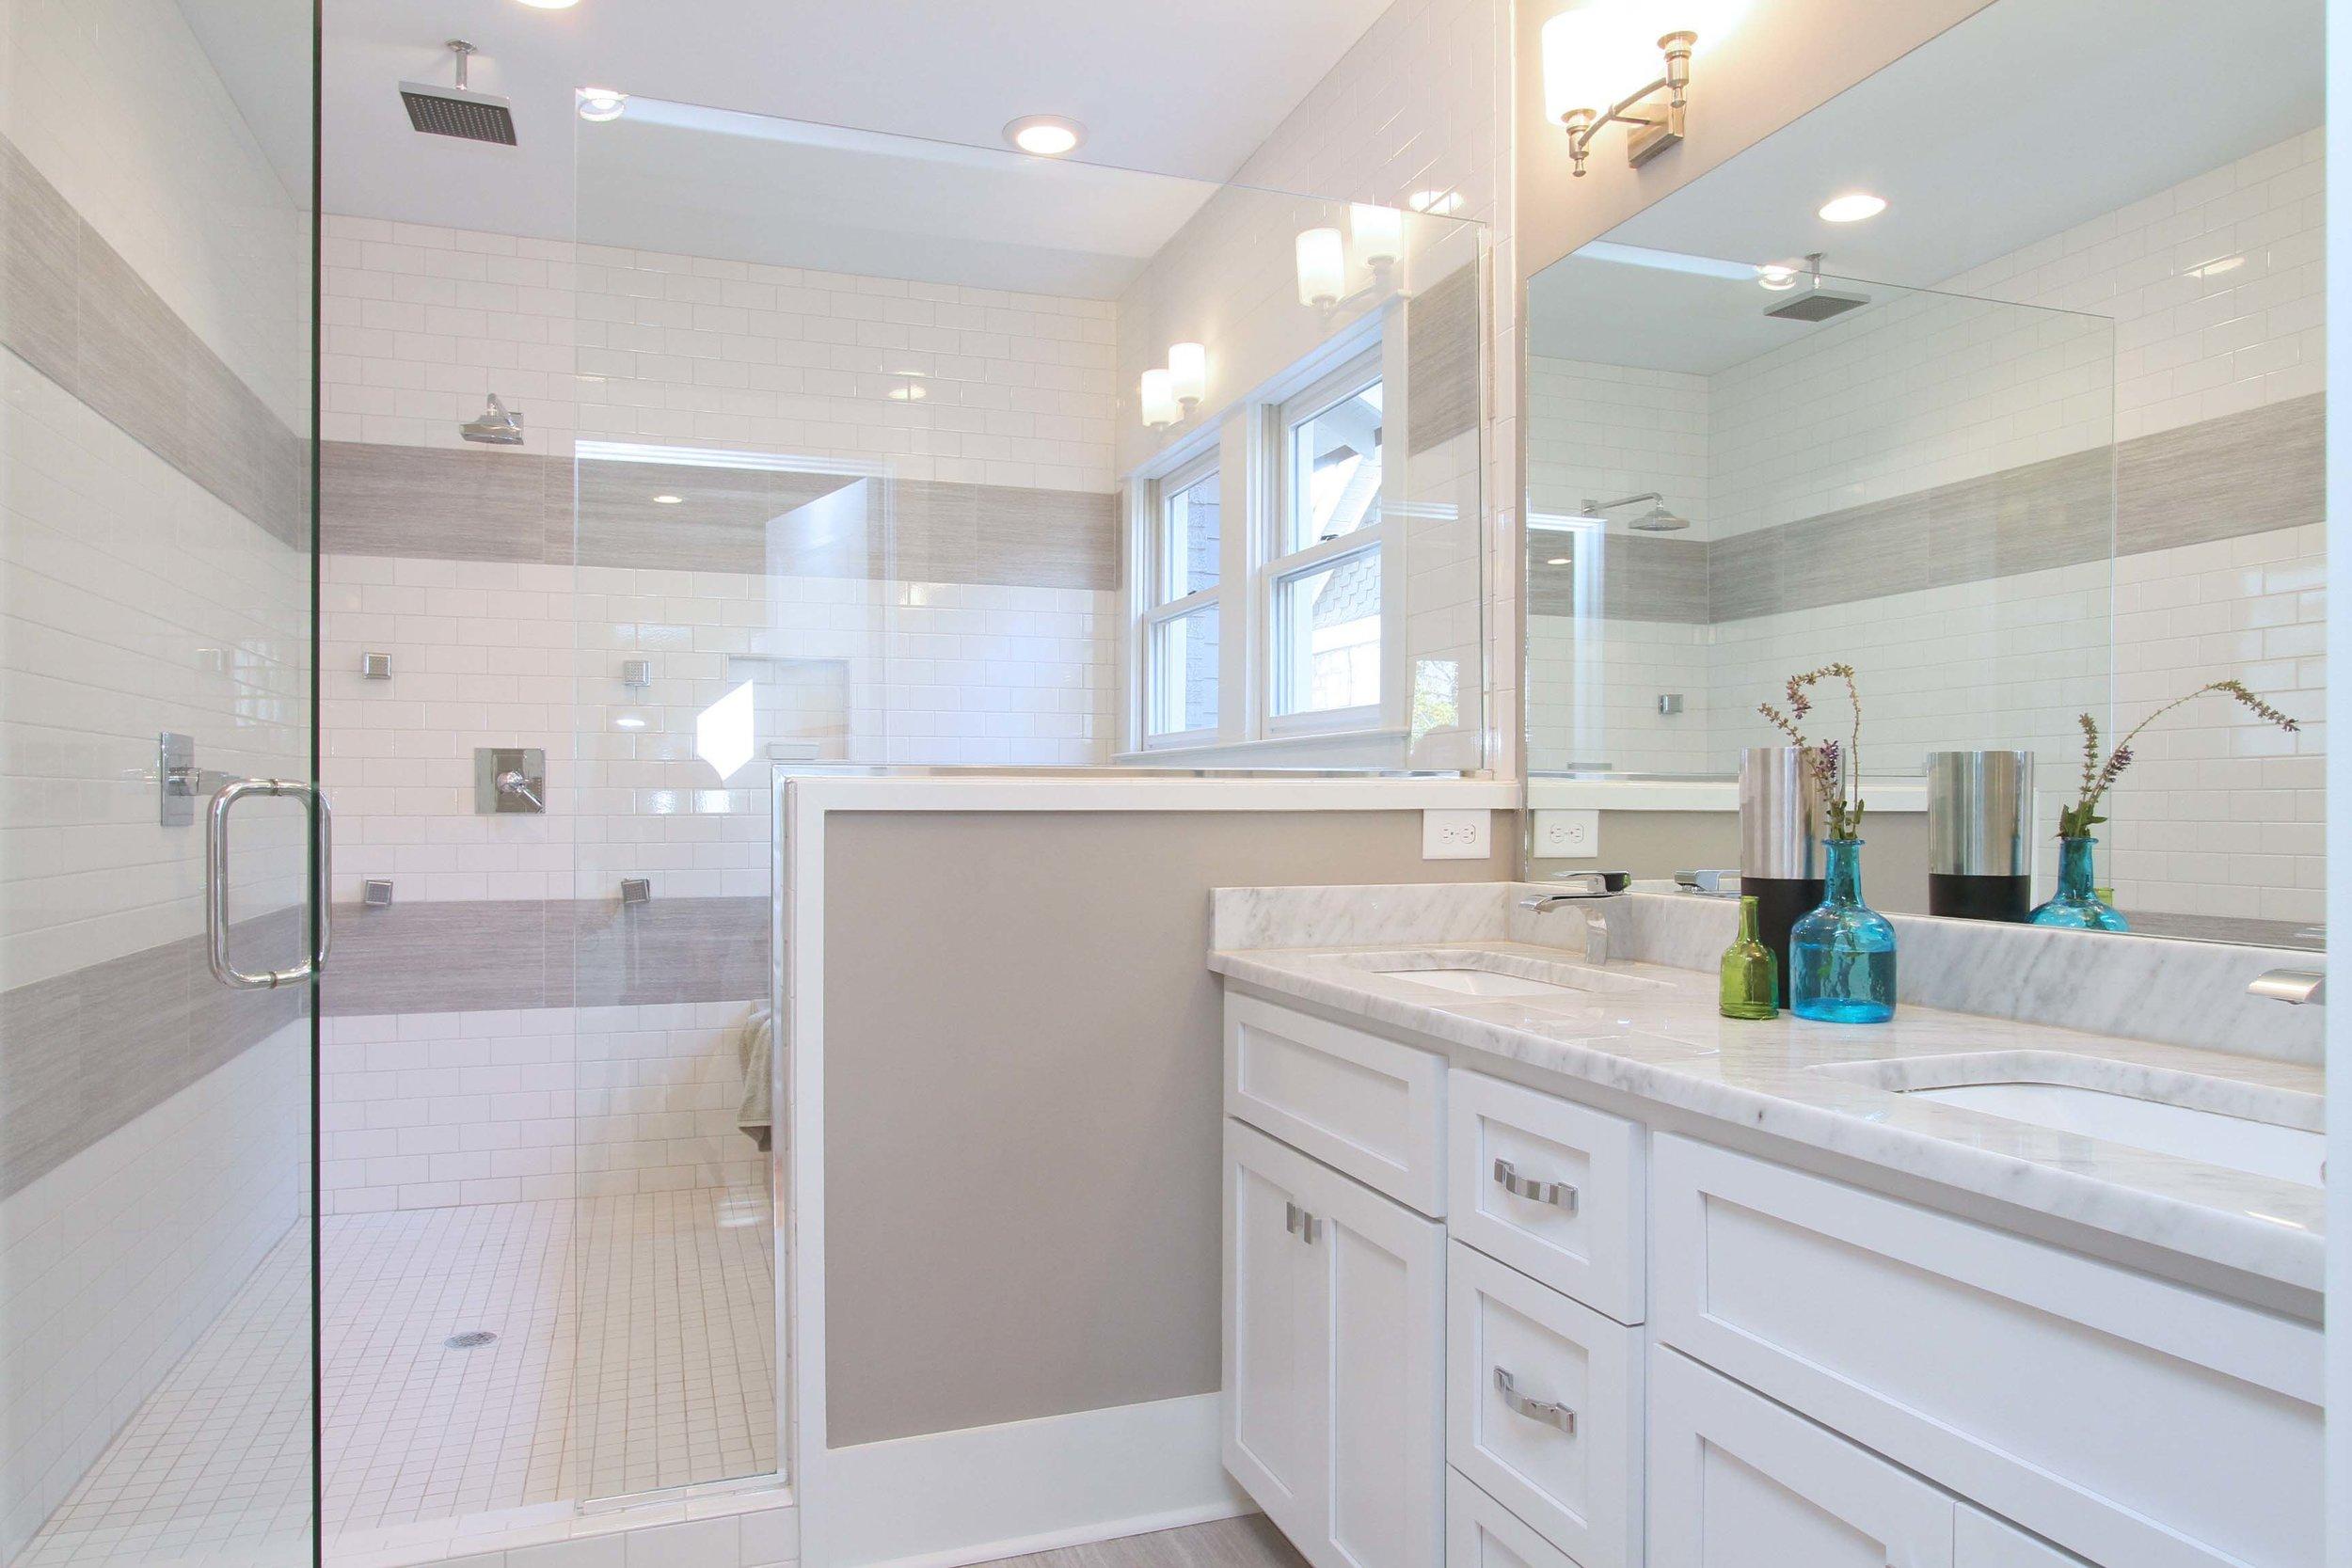 House-Plans-Online-Historic-Nashville-Peggy-Newman-Renovation-Wet Room-Master-Shower-Murphy.jpg